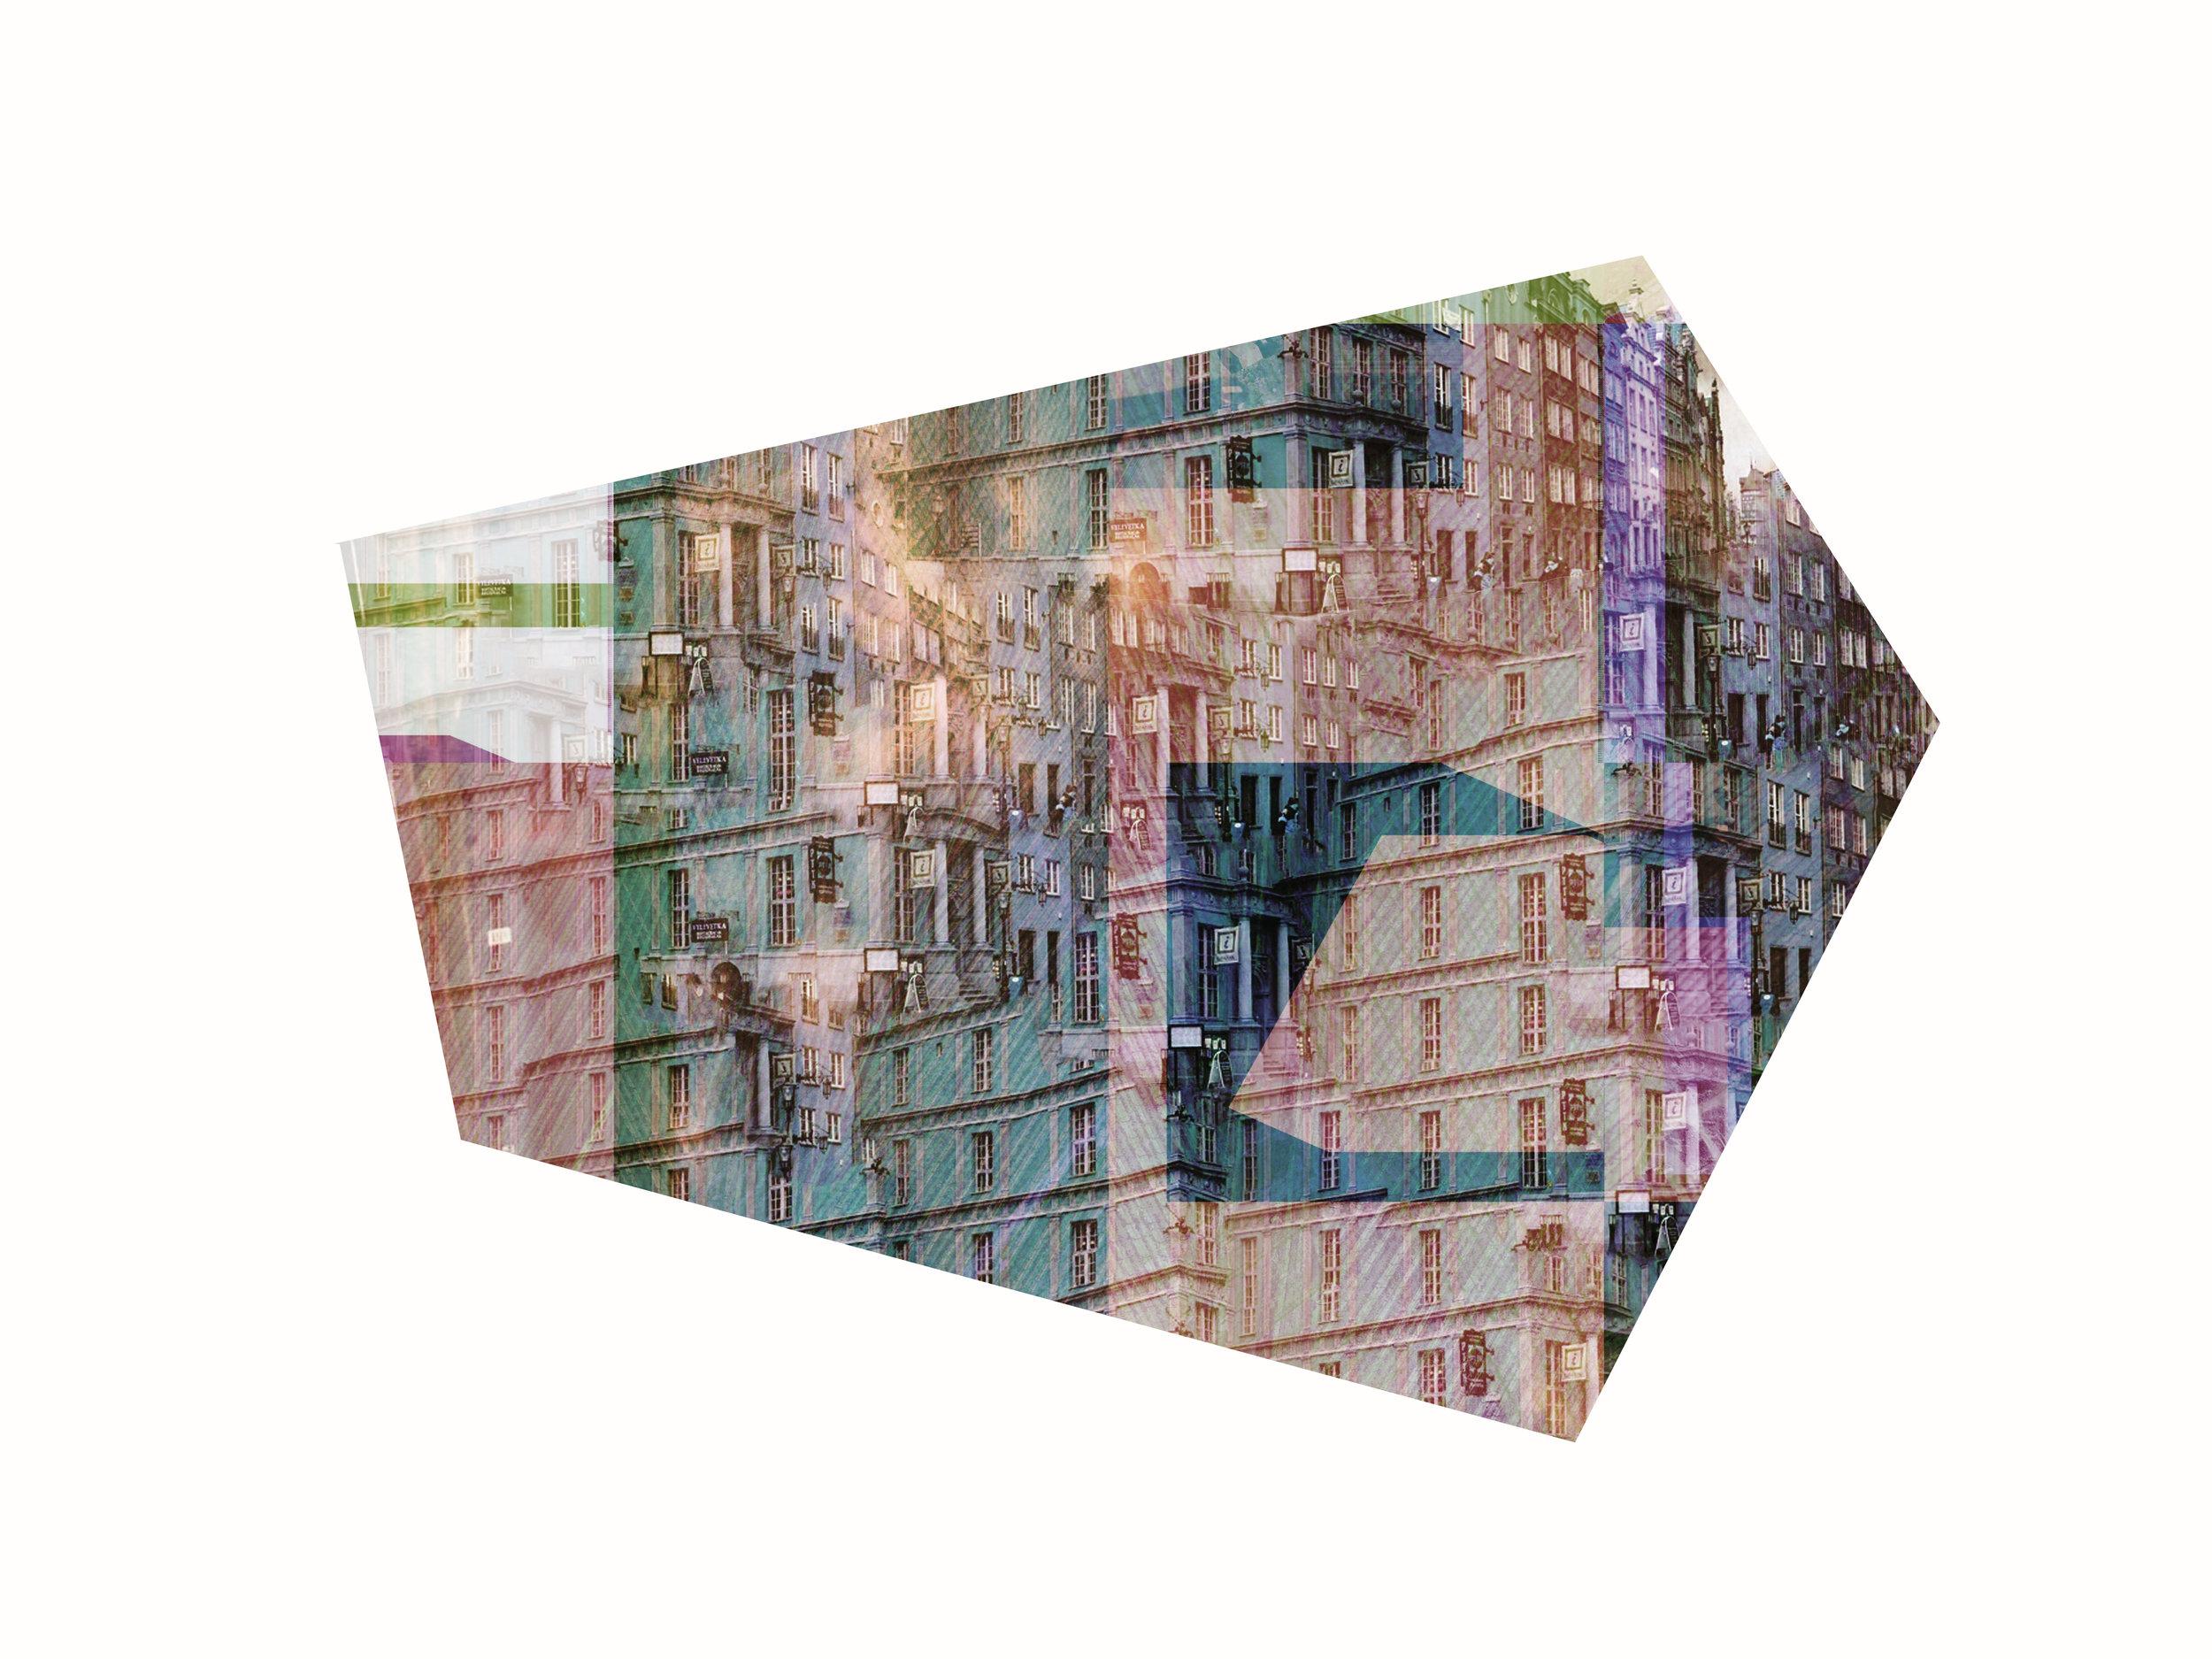 city_form_glitch_002.jpg